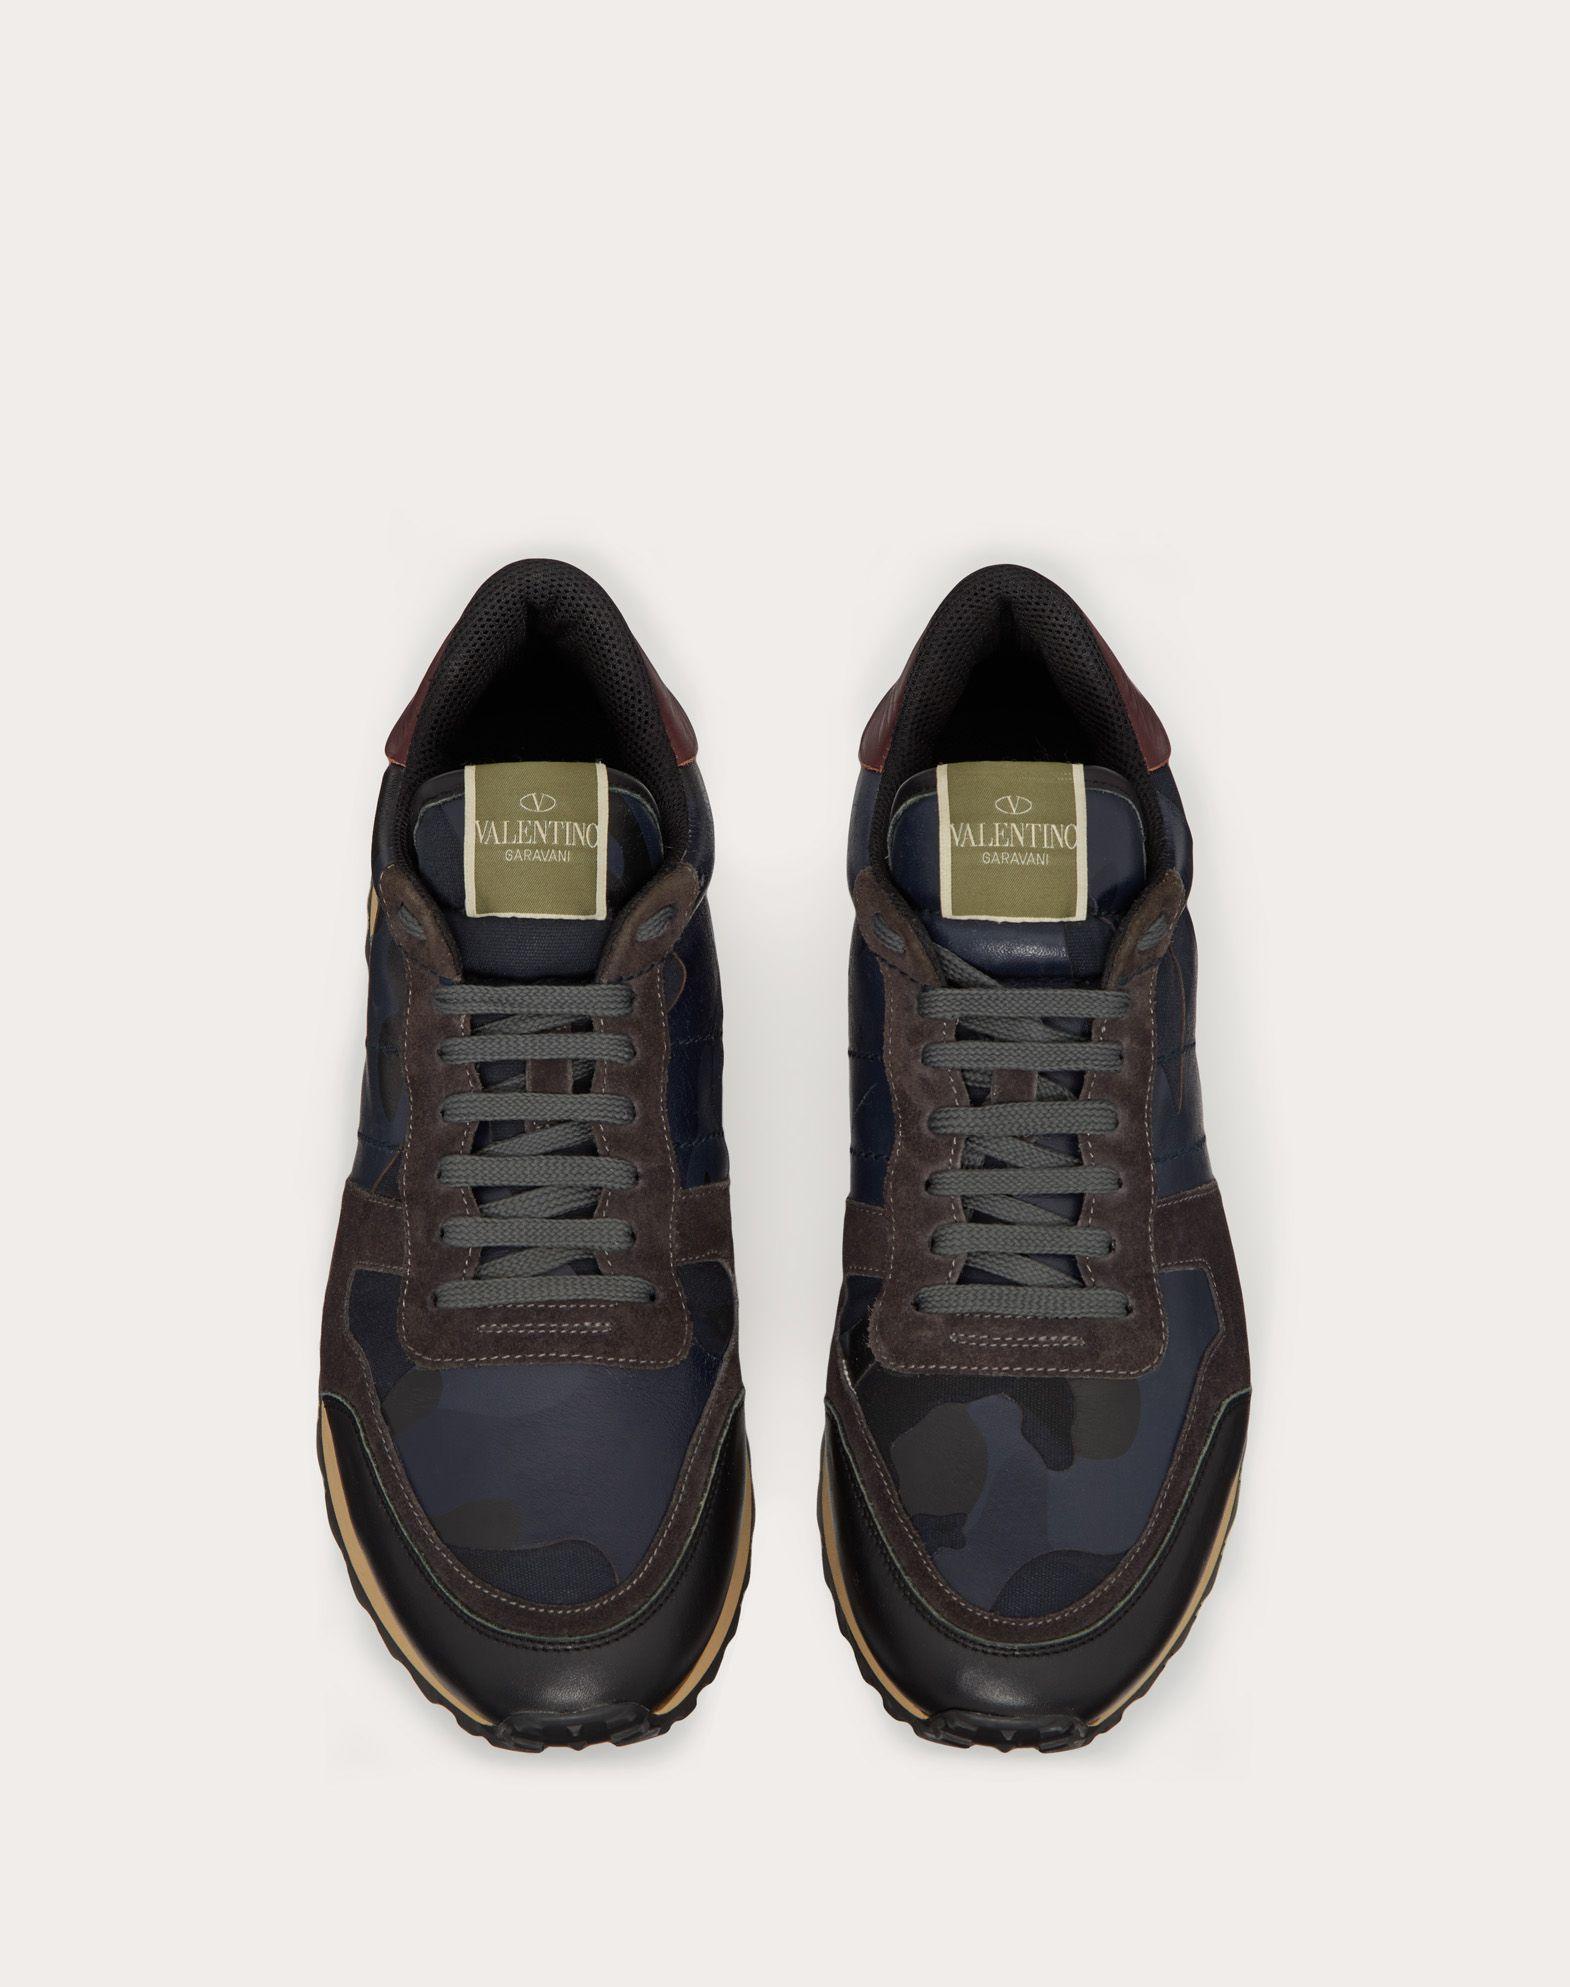 VALENTINO GARAVANI UOMO Camouflage Rockrunner Sneaker LOW-TOP SNEAKERS U e